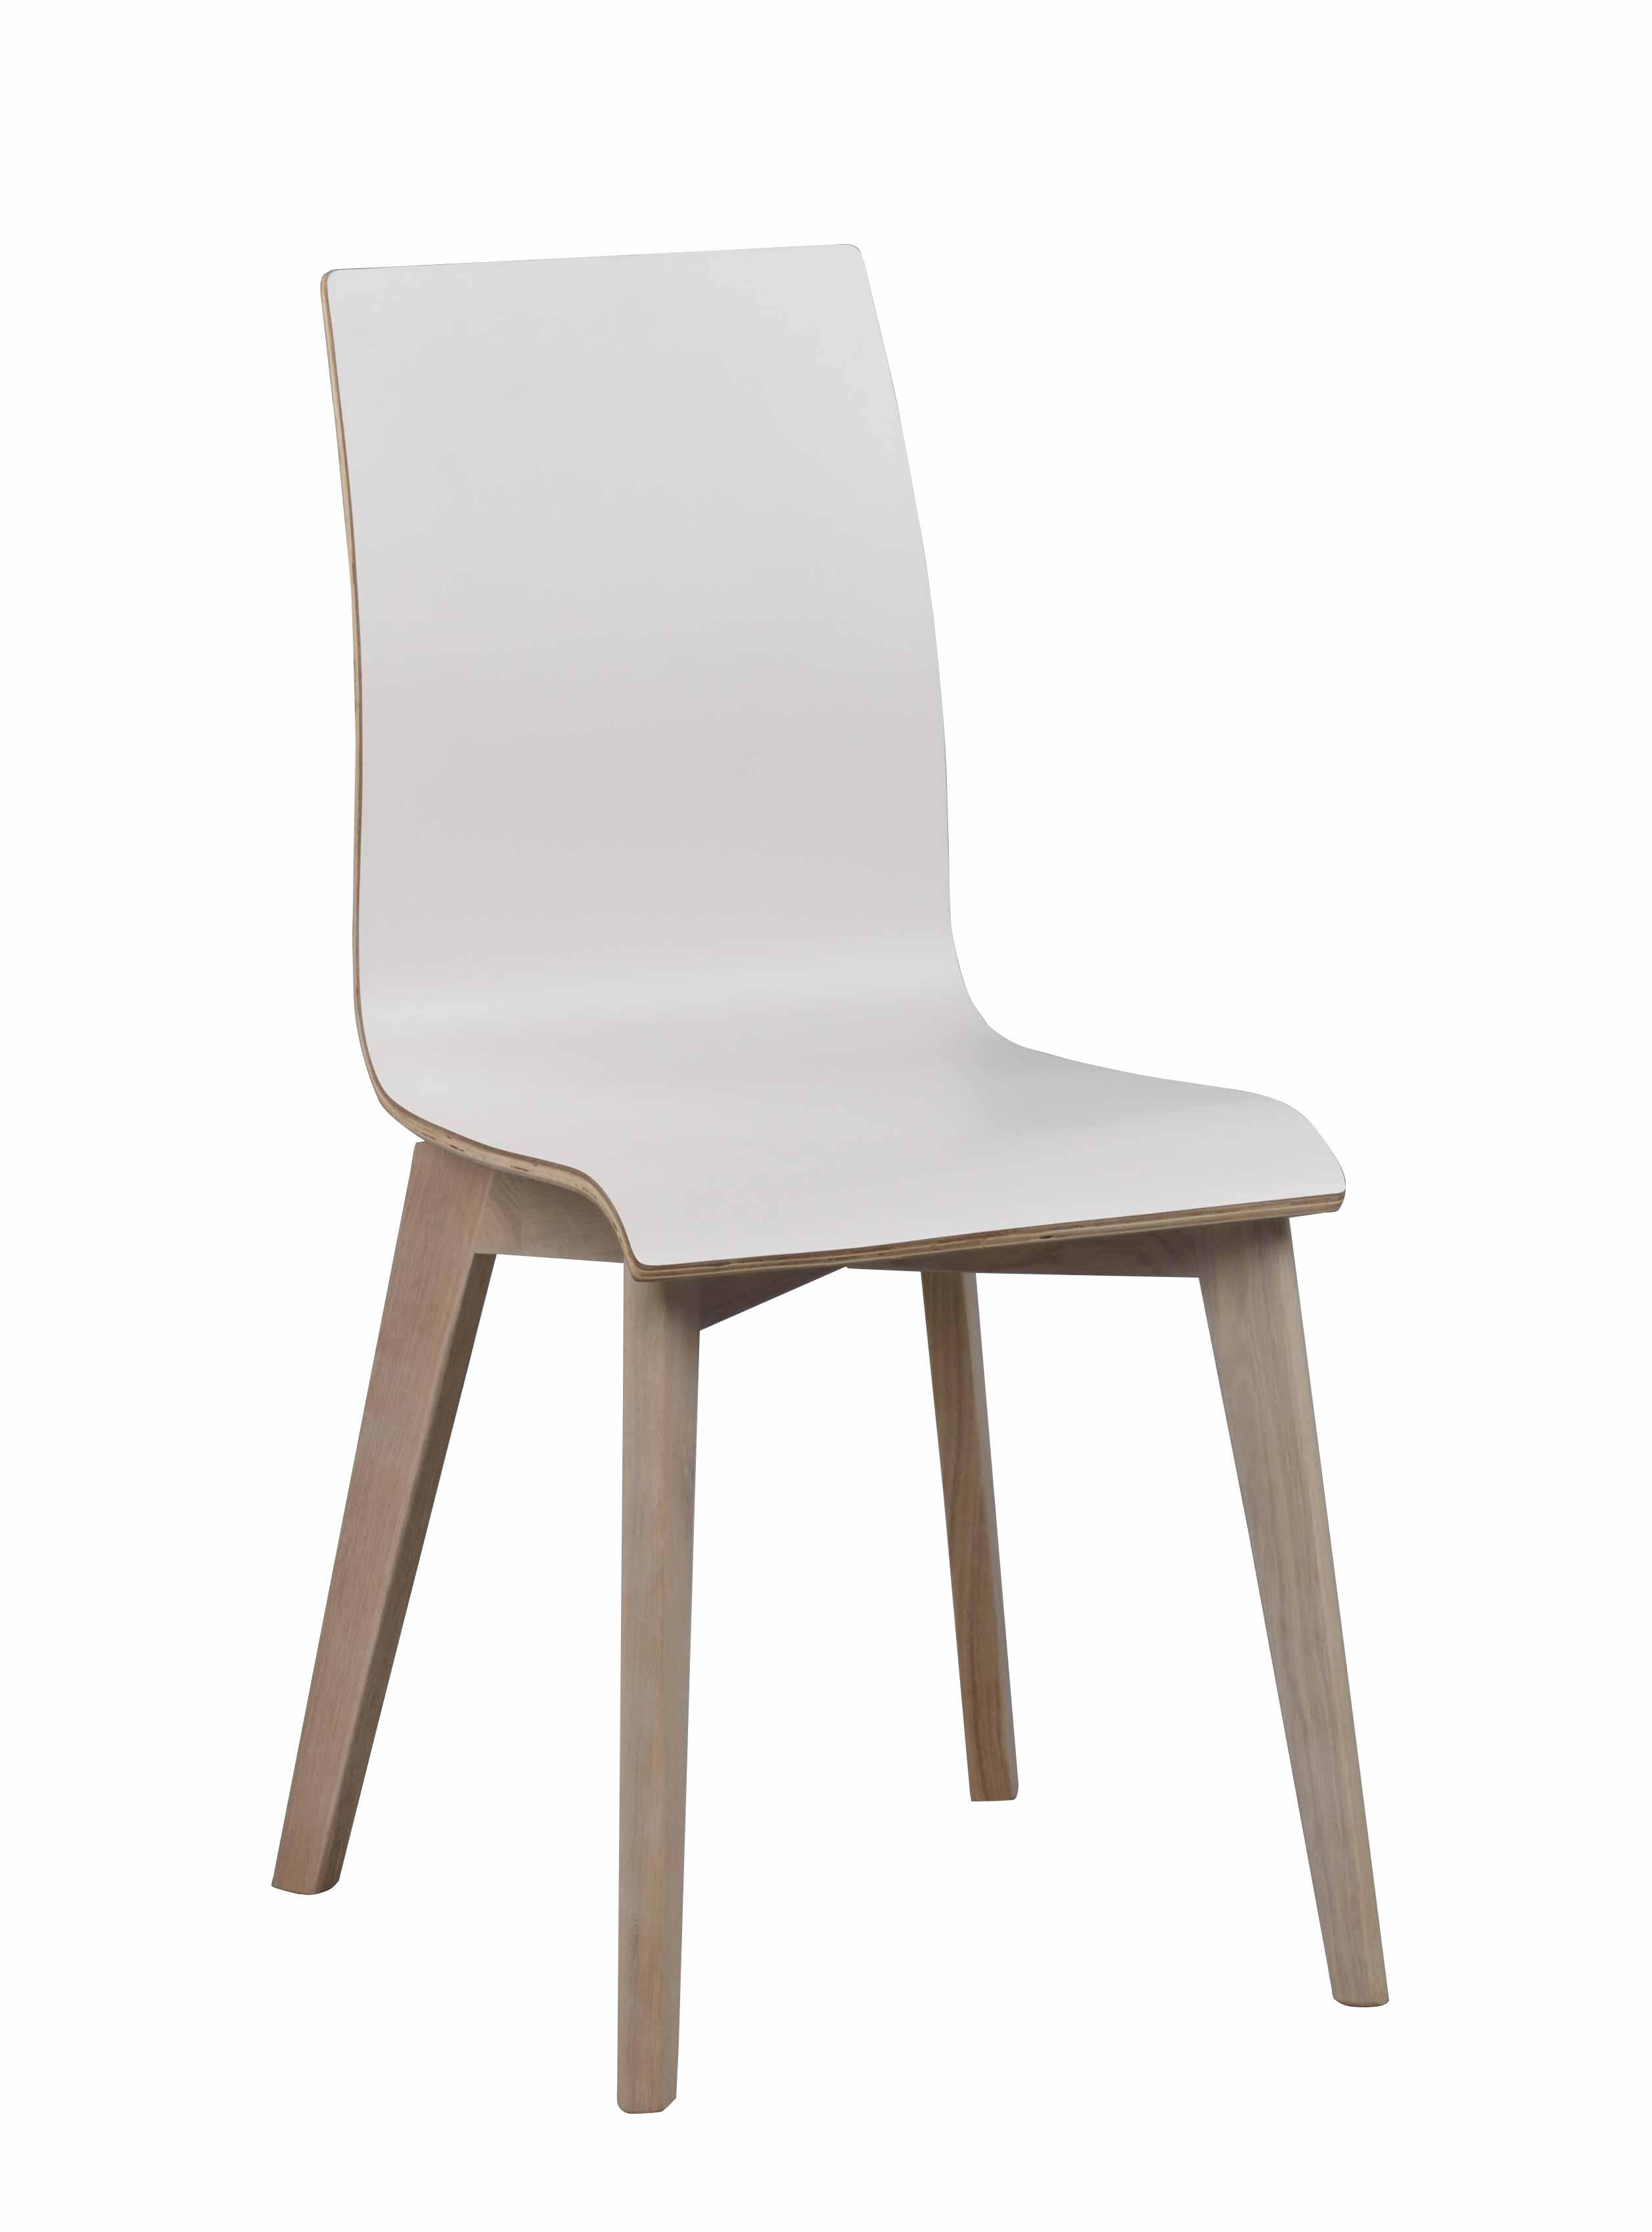 Grace spisebordsstol - hvid laminat/hvidpigmenteret eg